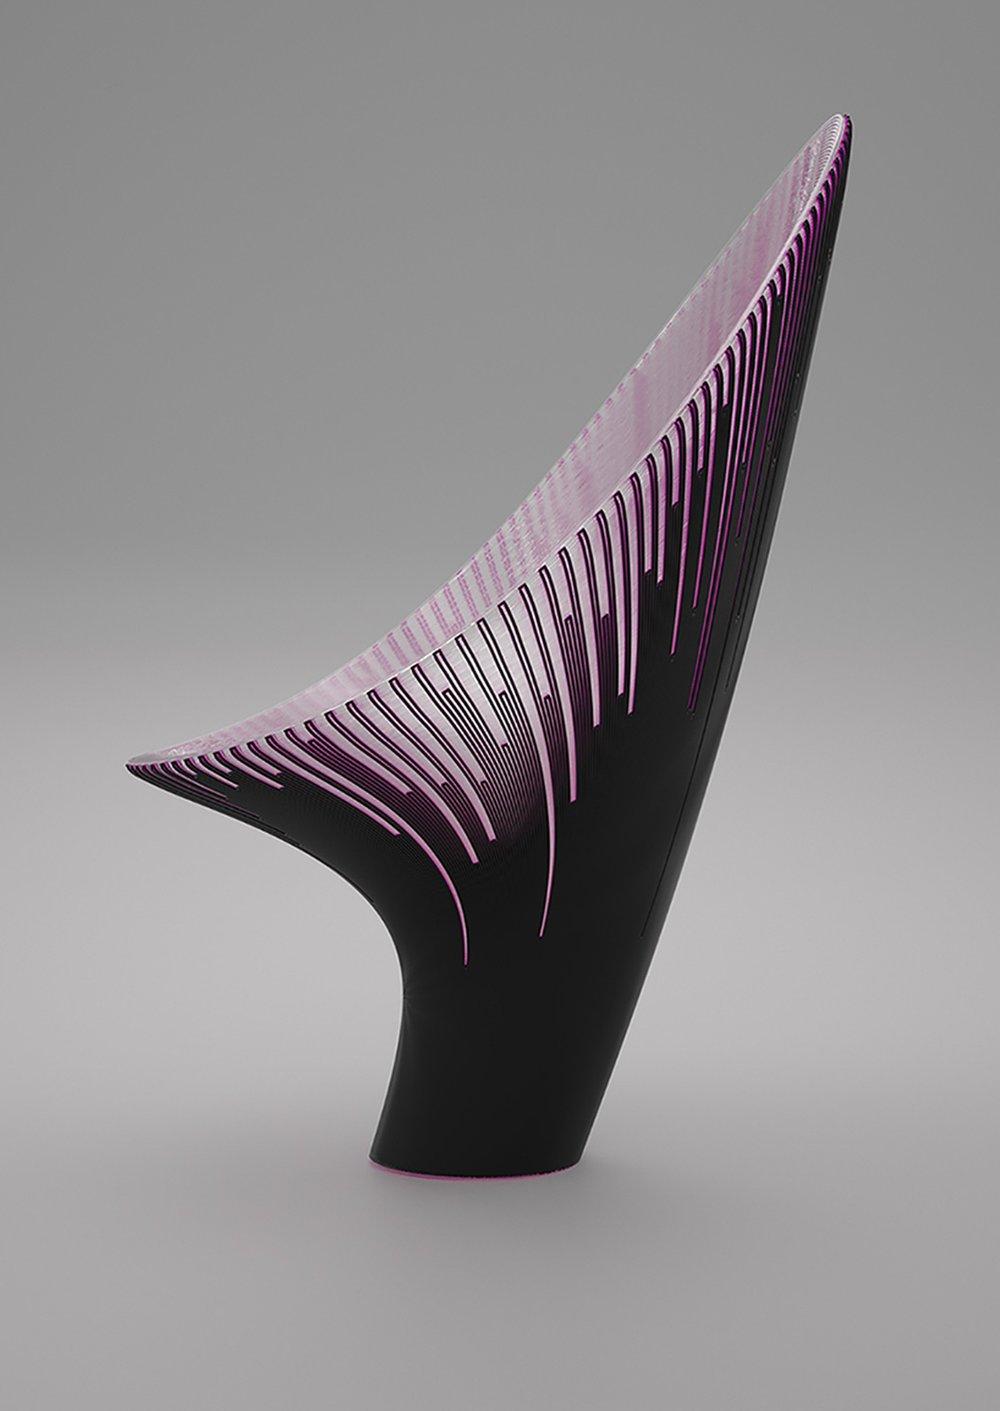 3D-Printed Chairs-Zaha Hadid-Visual Atelier 8-3.jpg